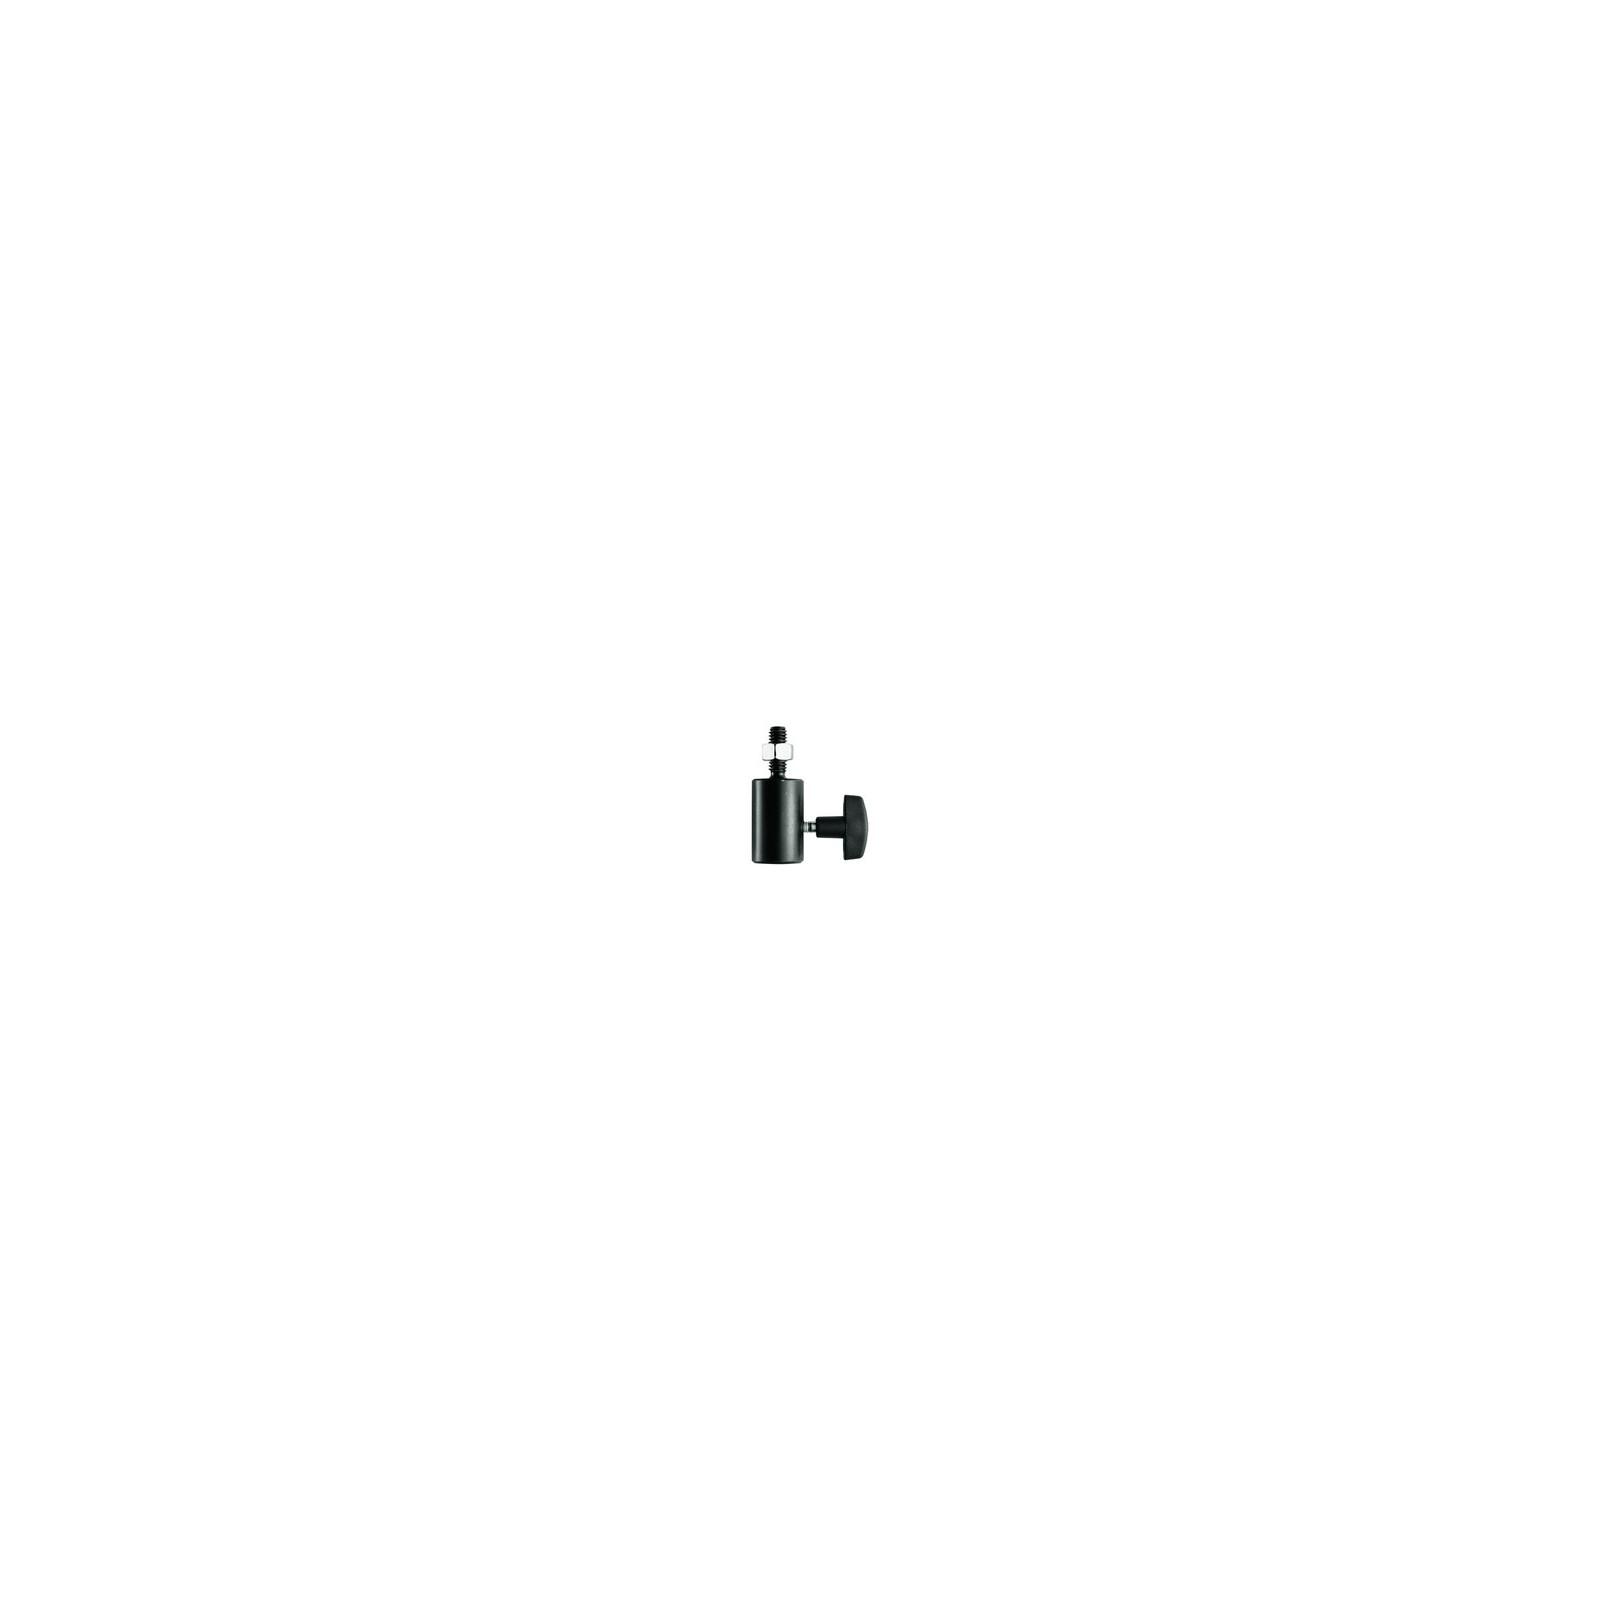 Manfrotto 014BIM Rapidadpter